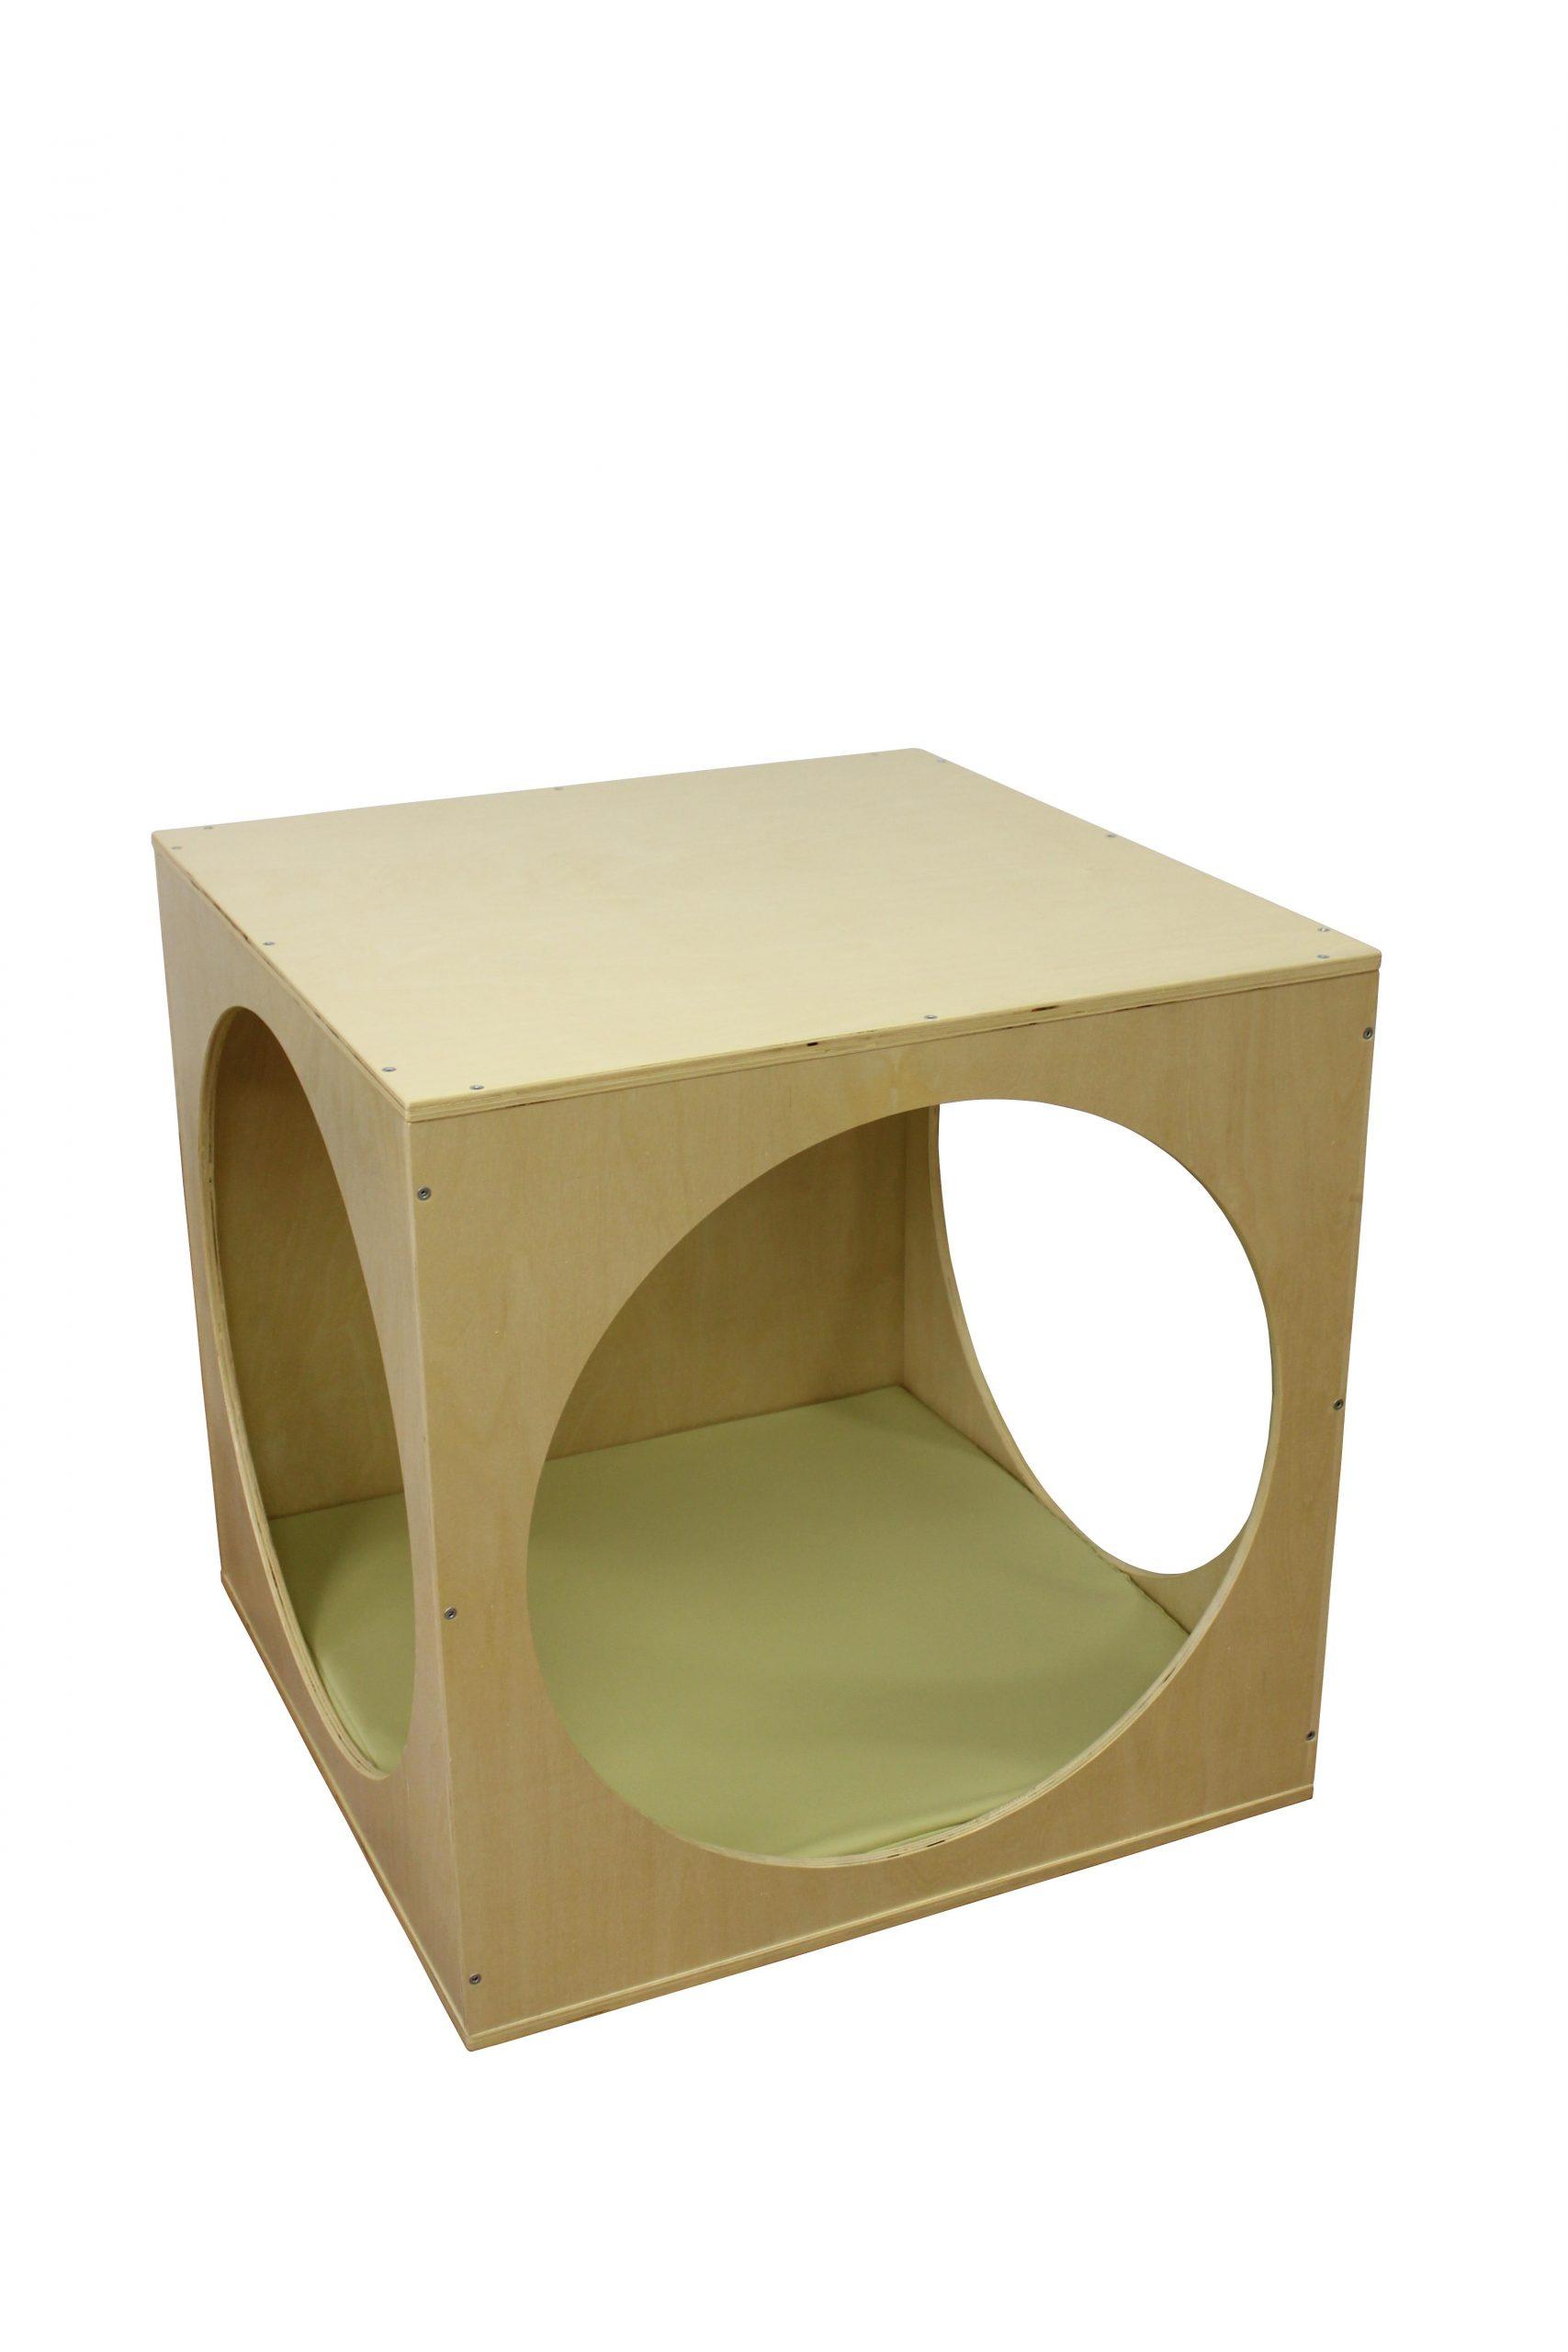 Birchwood Nursery Play Cube with Mat